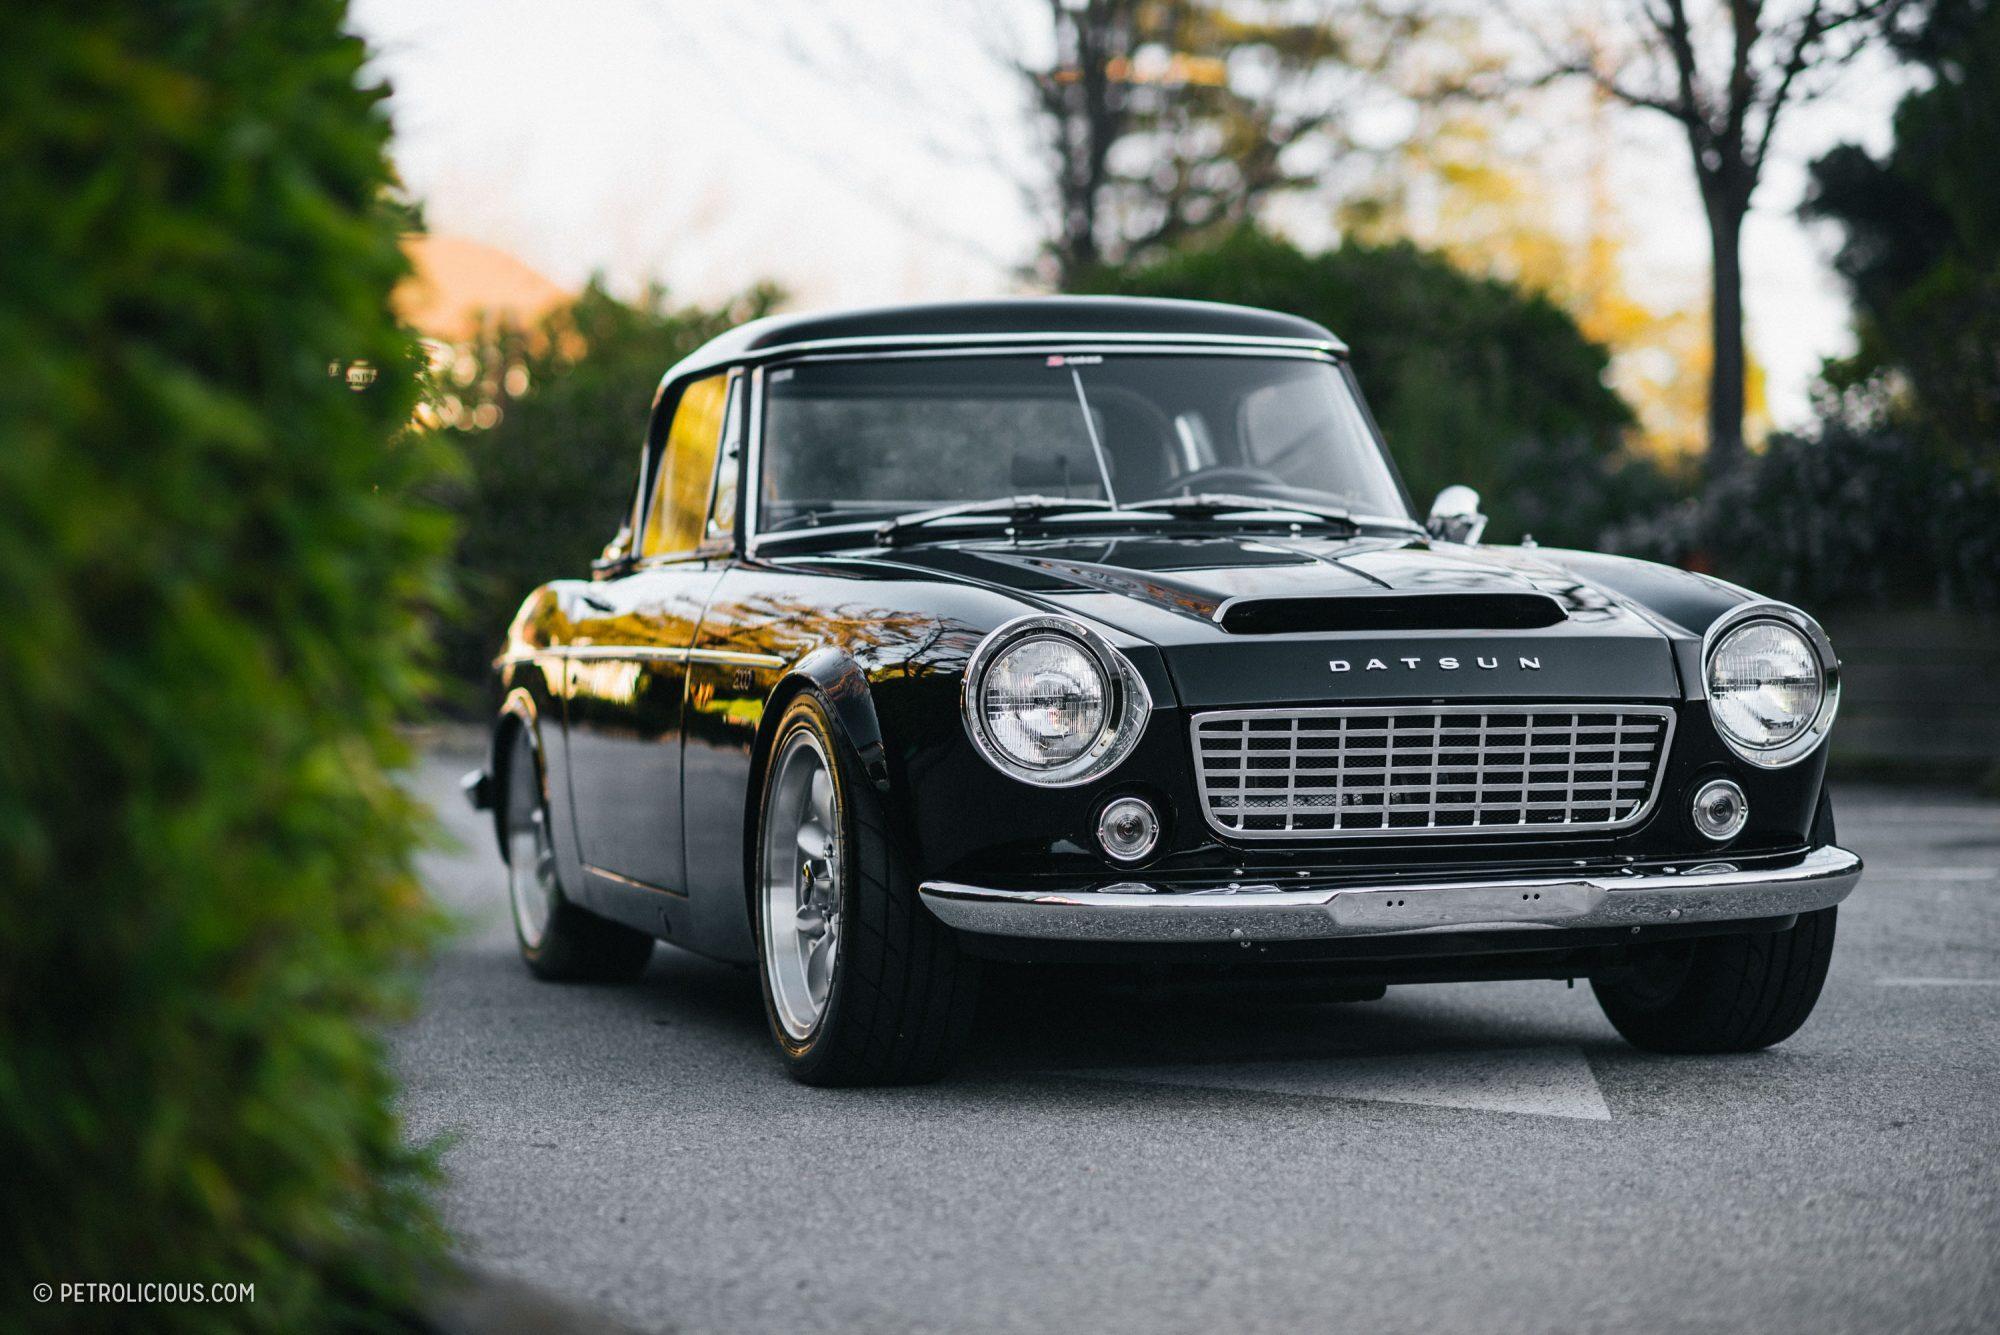 Datsun-Roadster-1960s-1